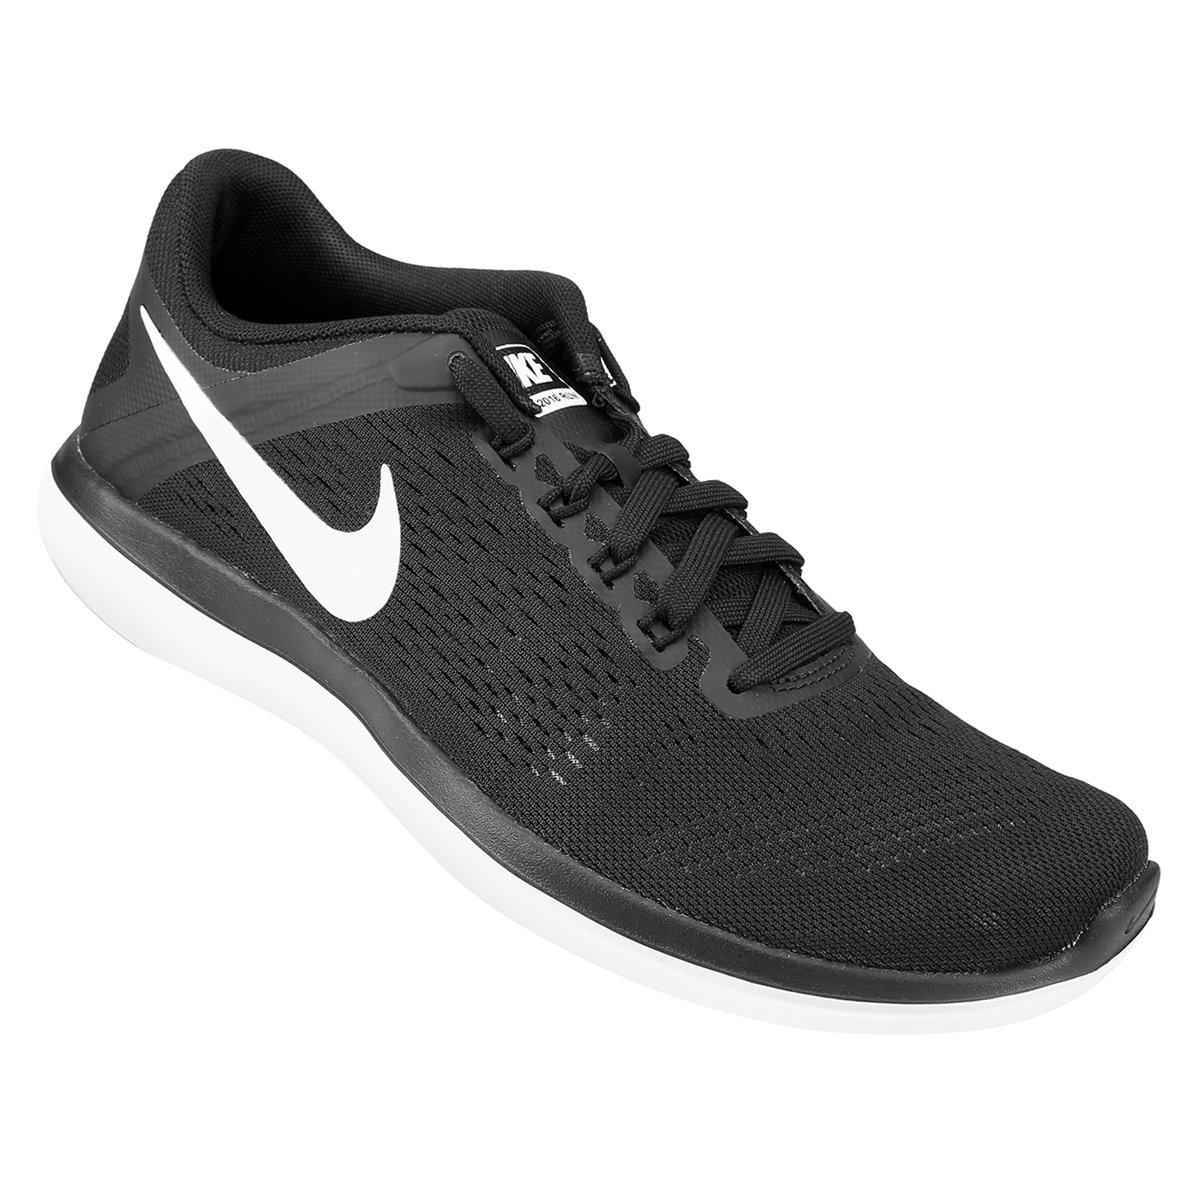 470b8f1b2cd14 Tênis Nike Flex 2016 RN Masculino - Compre Agora